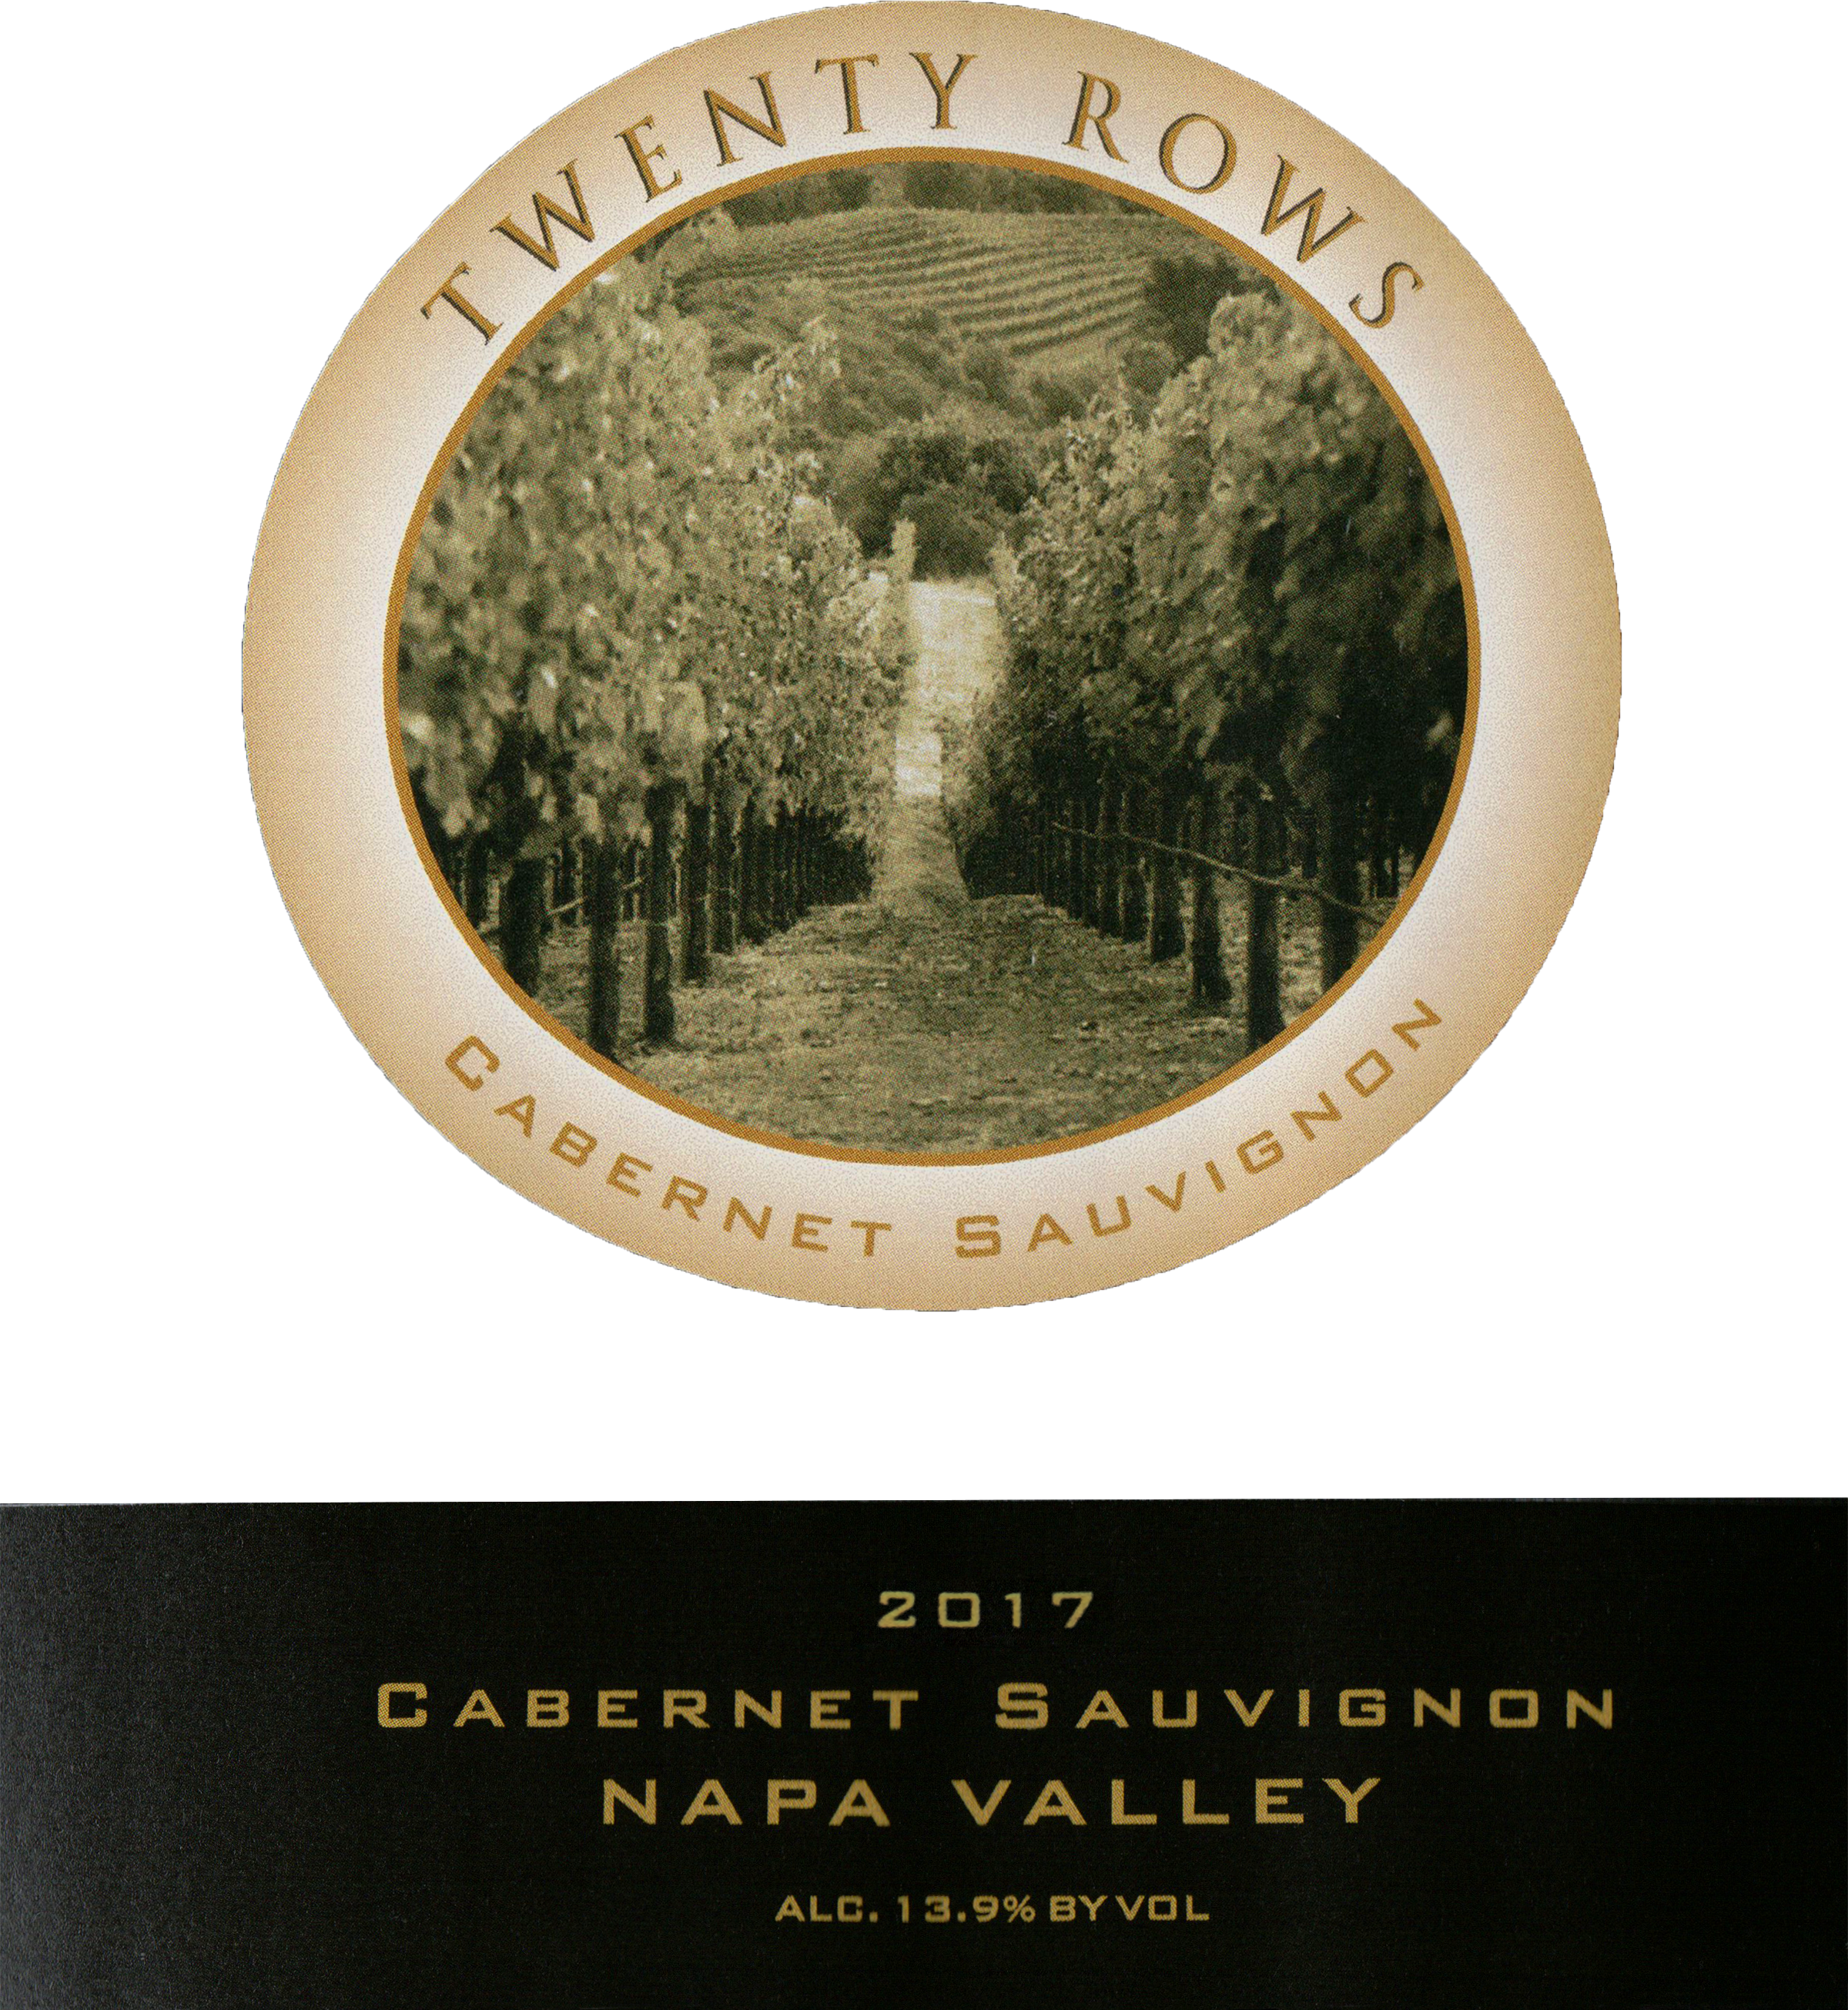 Twenty Rows Cabernet Sauvignon 2017